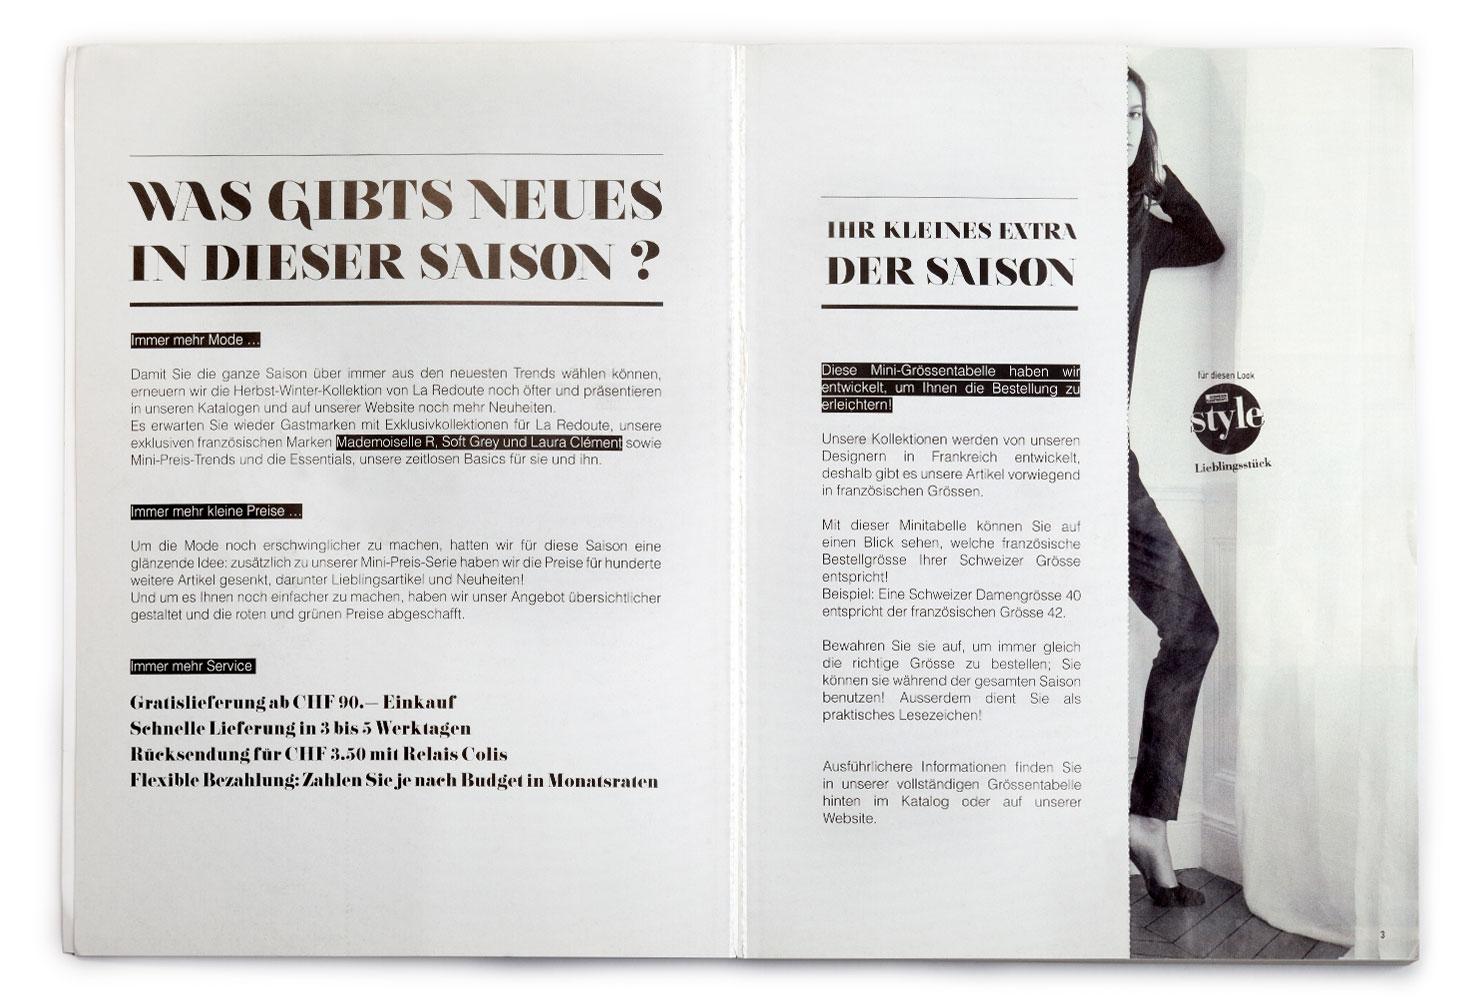 La Redoute Katalog 2014 Seite 3